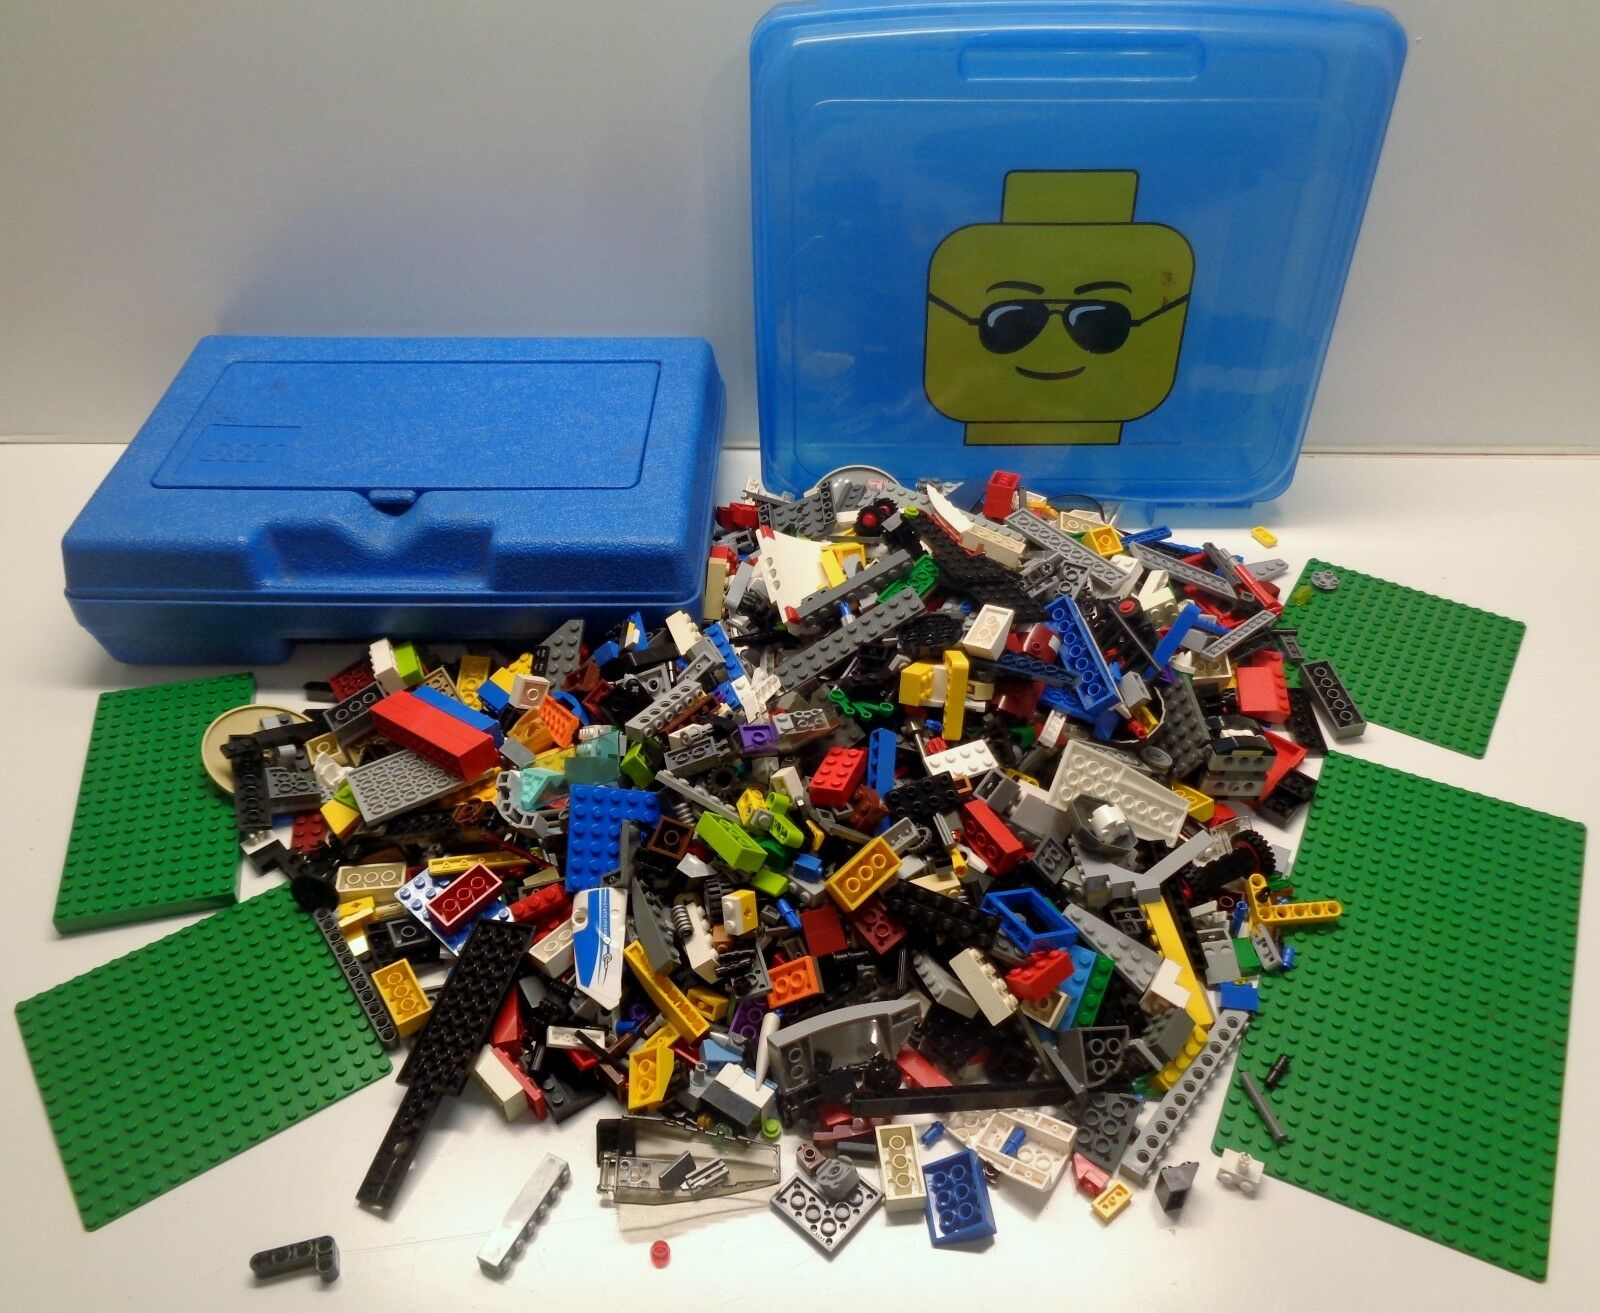 2 LEGO Blau Storage Containers & 4.75 pounds of Lego Parts Pieces